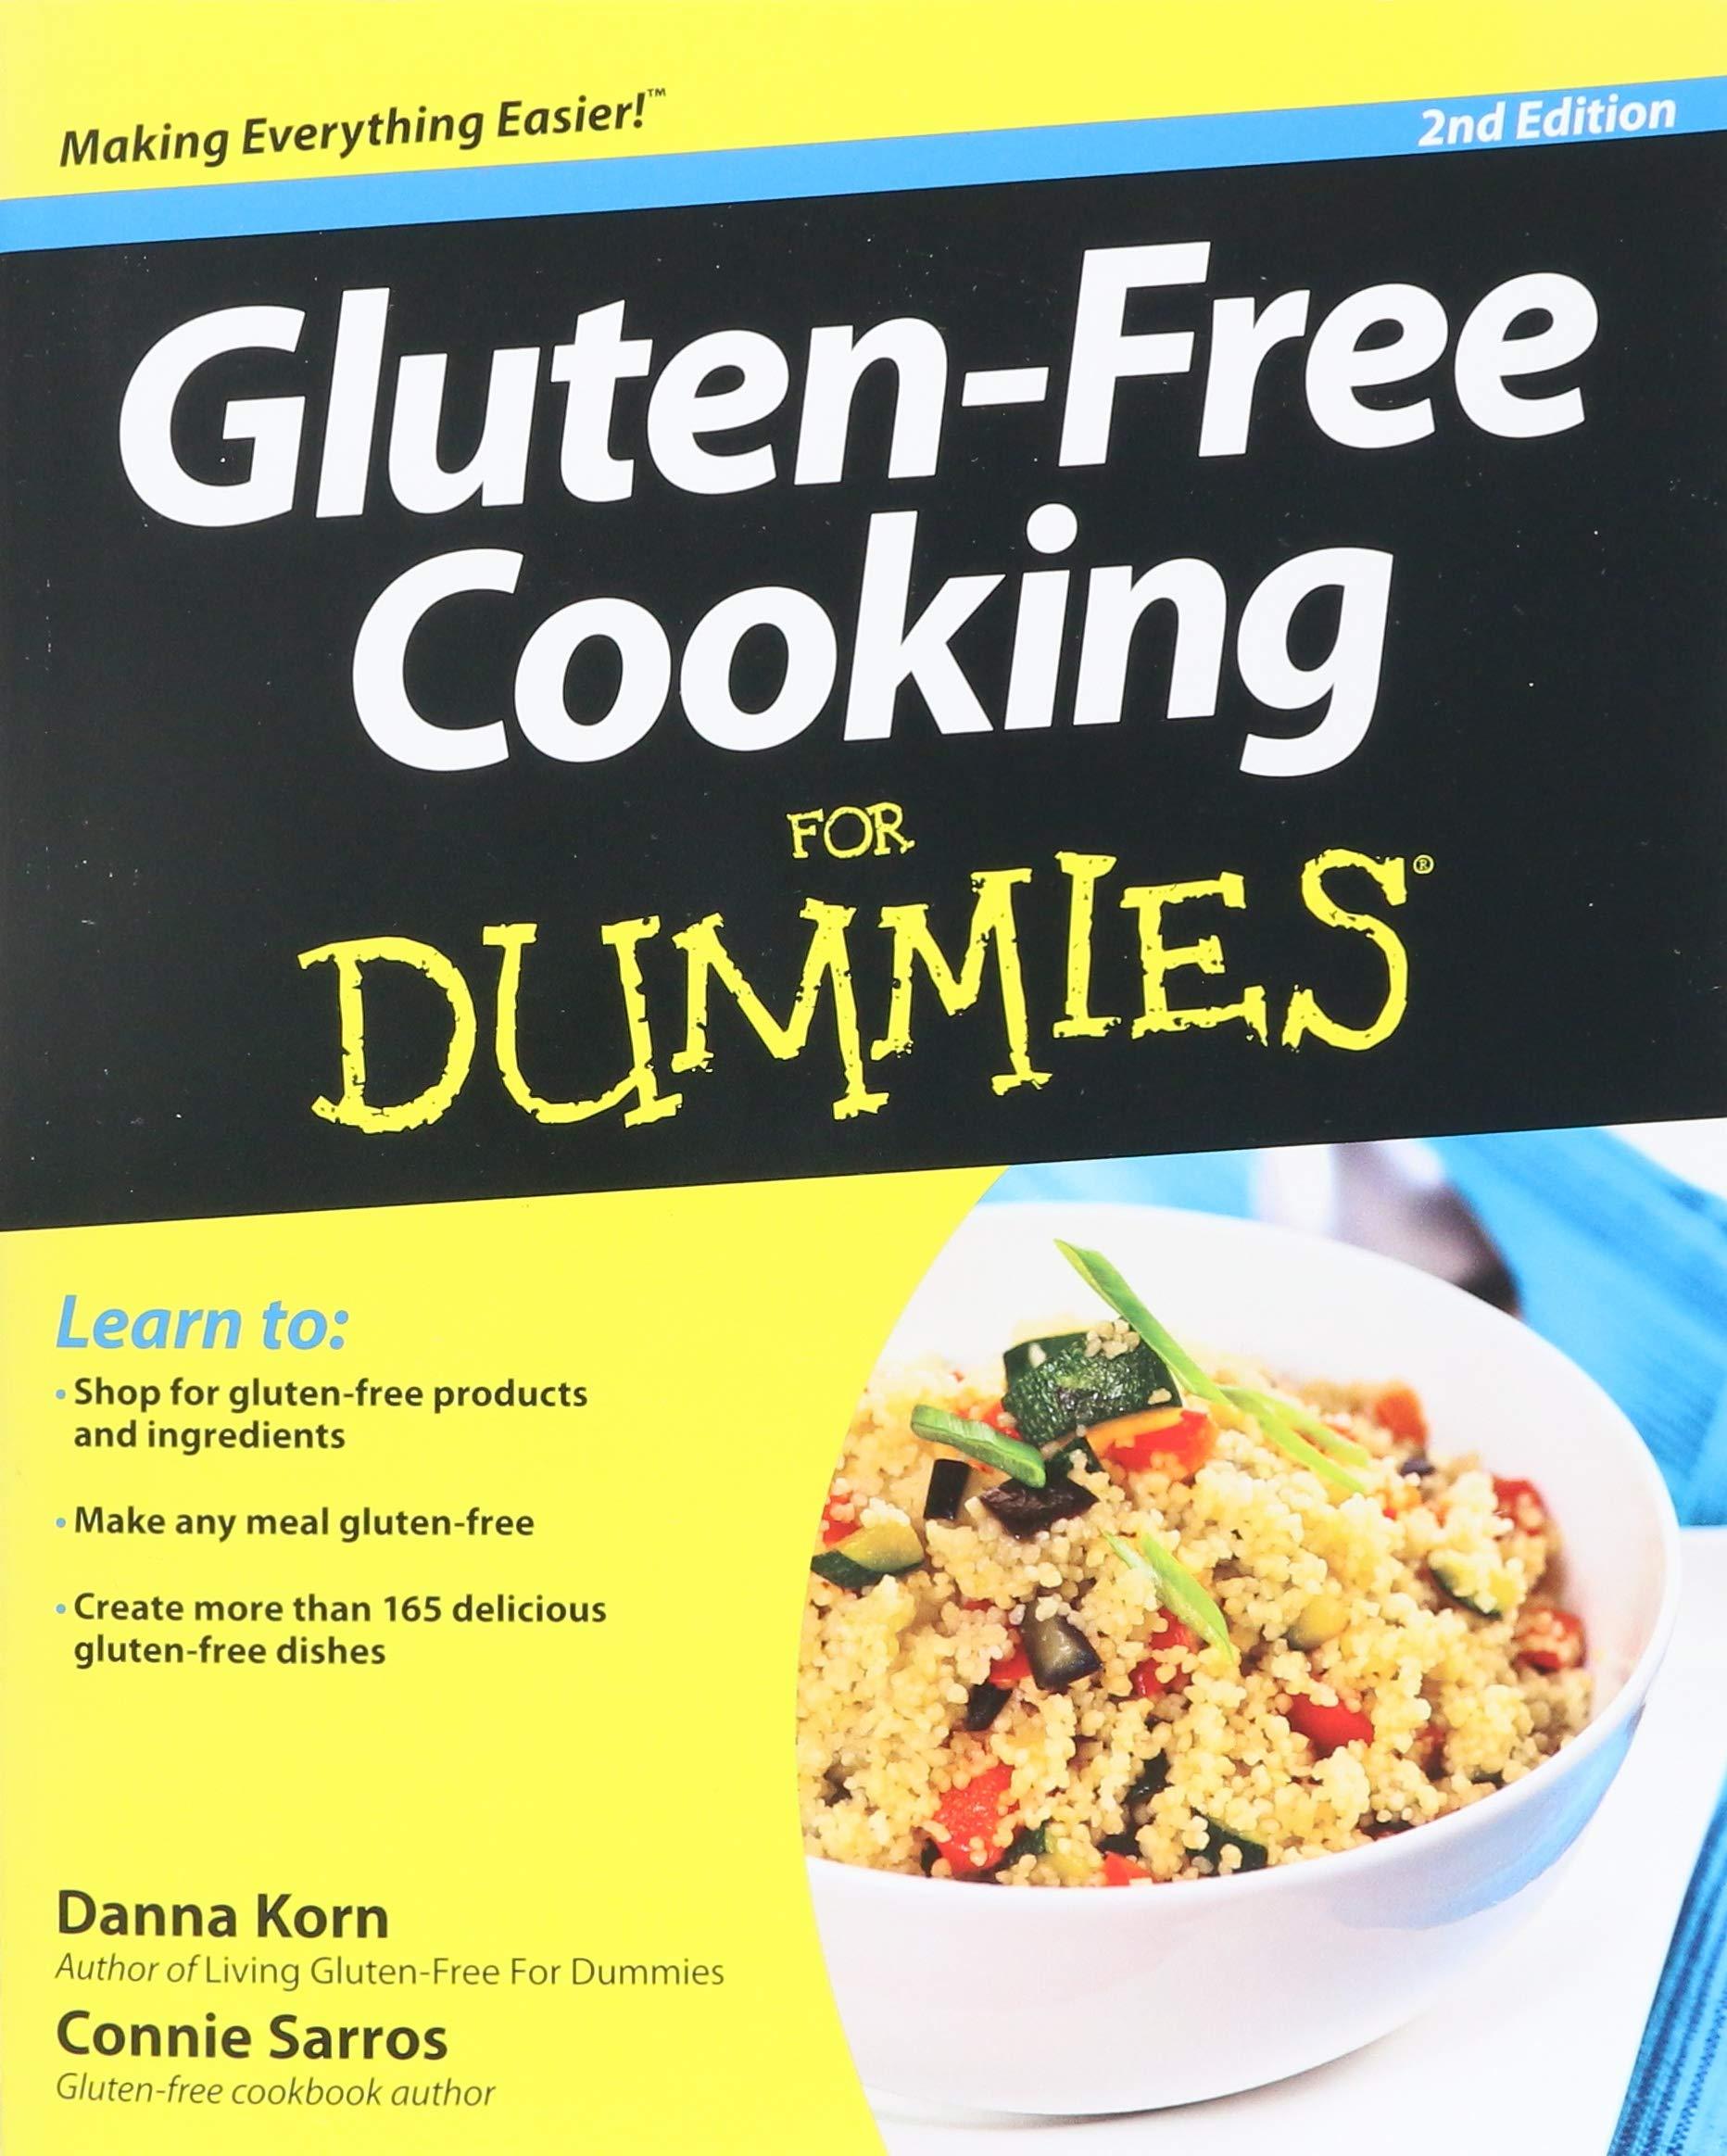 Gluten-Free Cooking For Dummies ebook